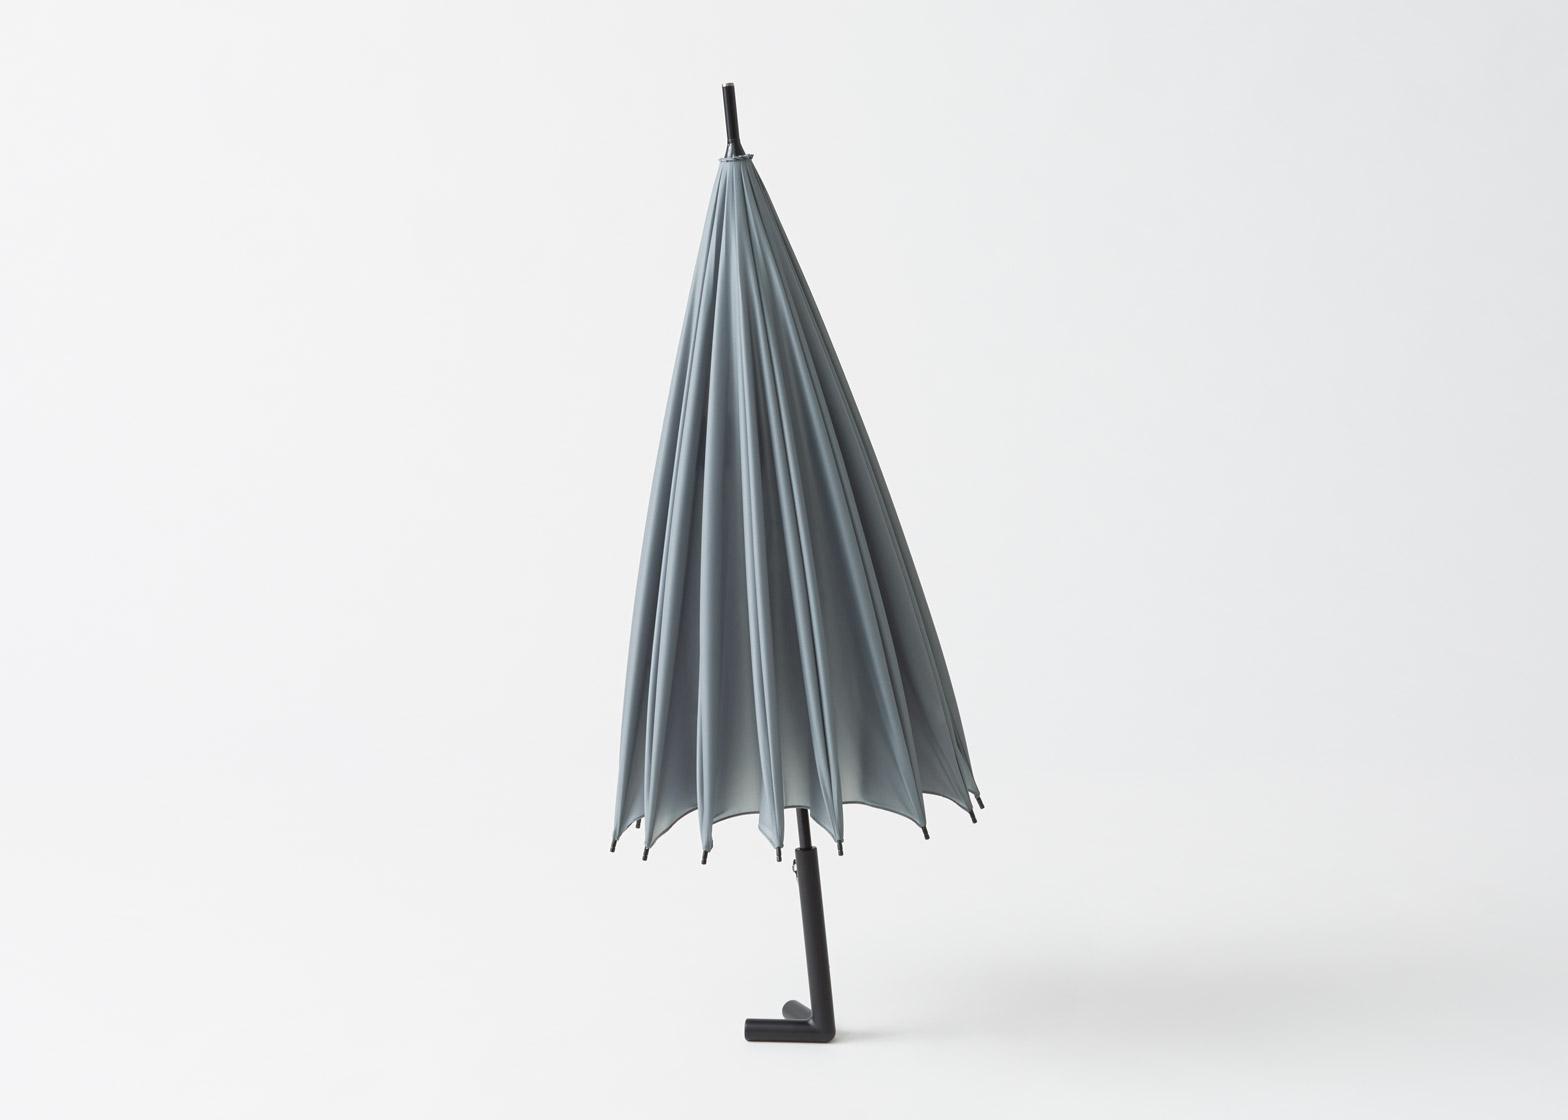 Nendo restrospective exhibition